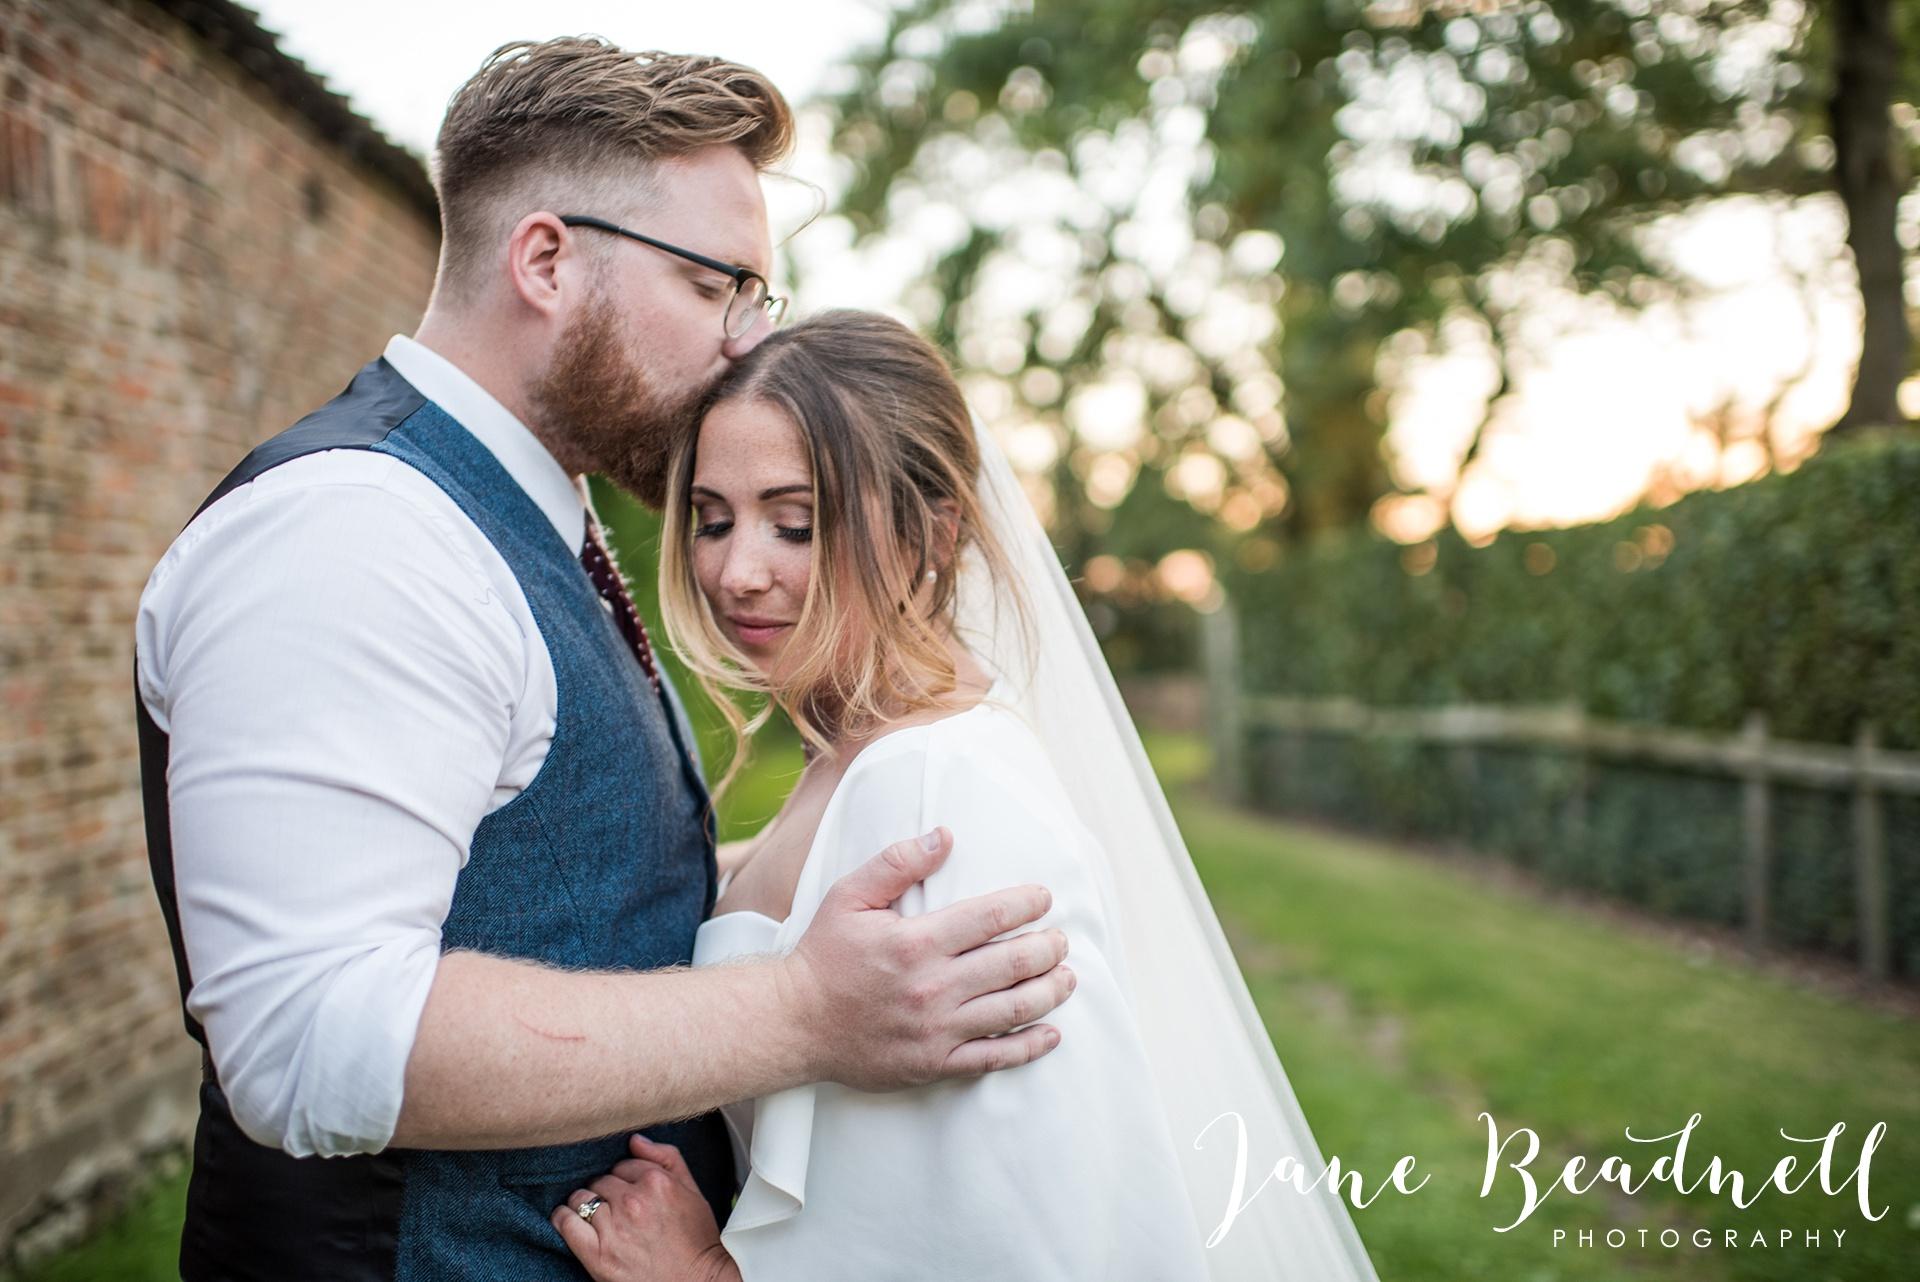 fine-art-wedding-photographer-jane-beadnell-yorkshire-wedding-photographer-garden-wedding_0151